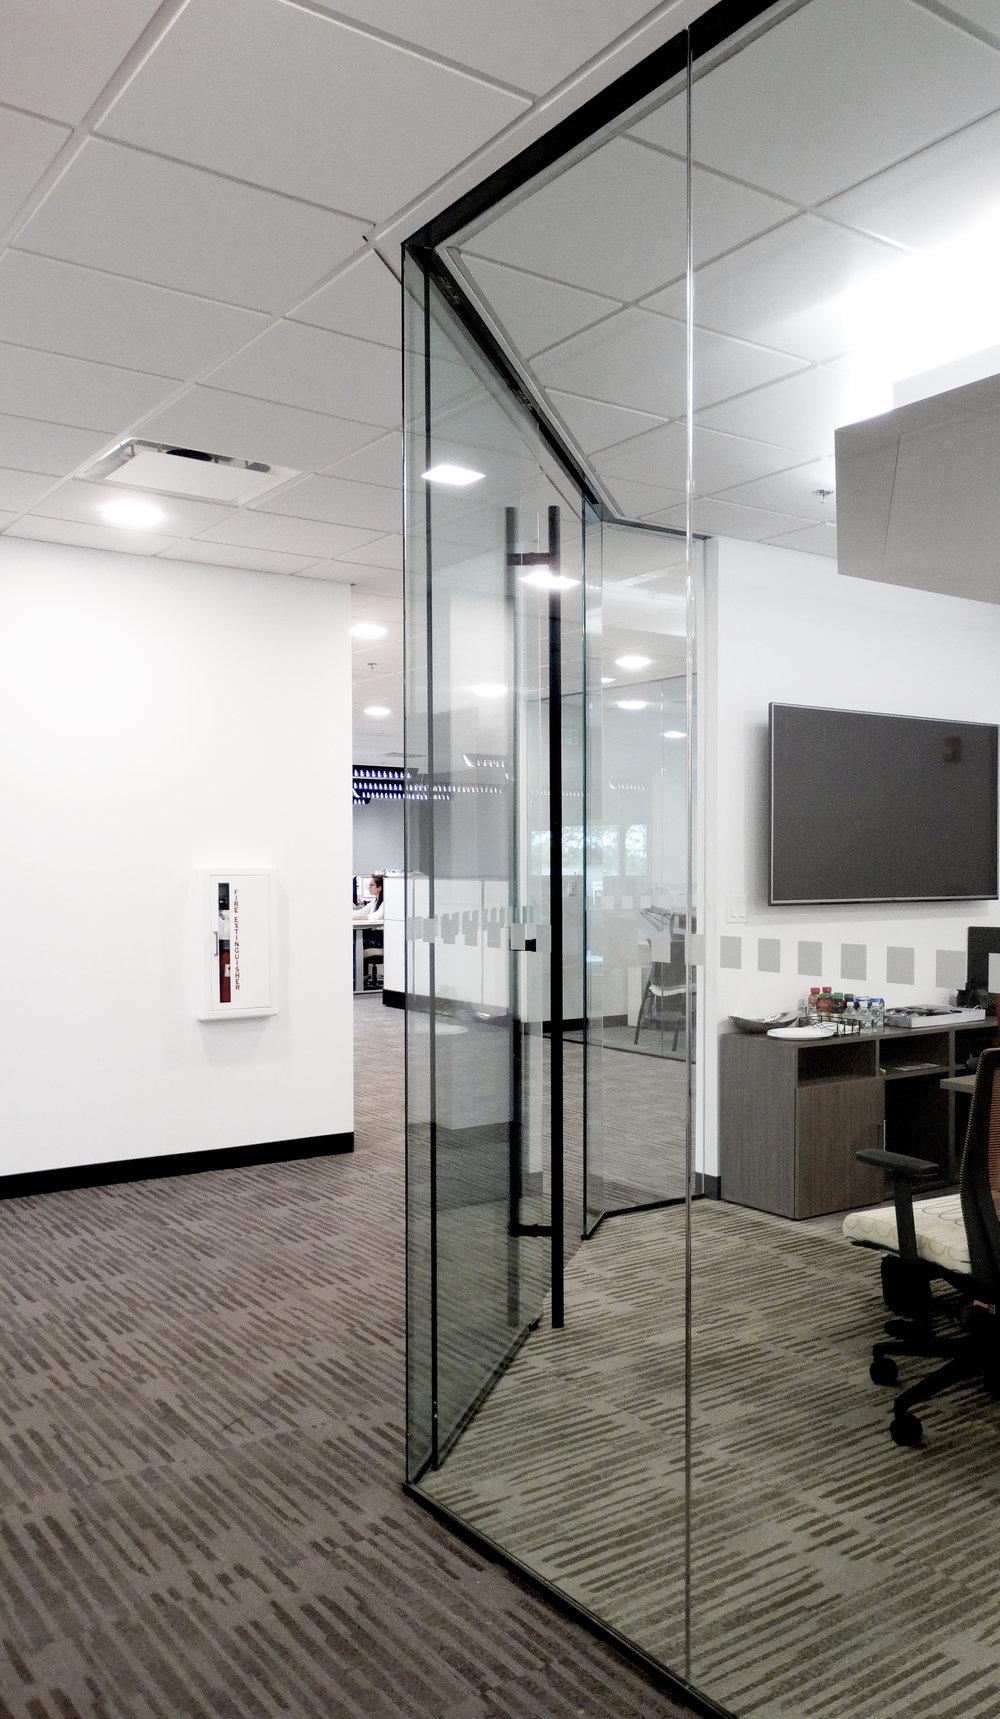 Illume Frameless Glass Sliding Door Office Wall - Spaceworks AI.JPG